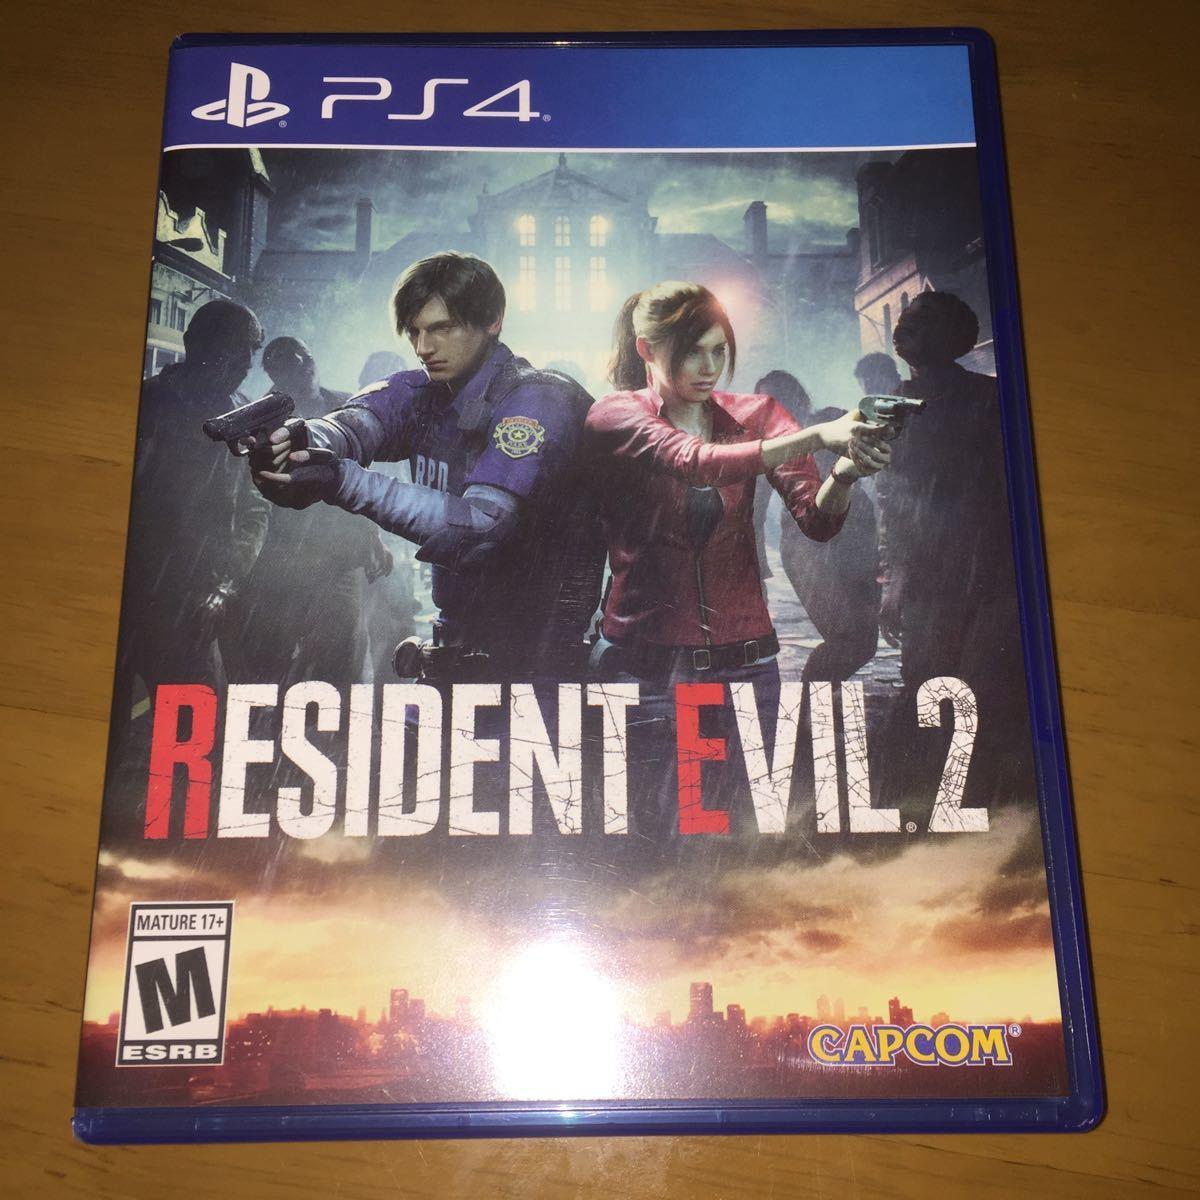 PS4 バイオハザードRE:2 北米版 RESIDENT EVIL